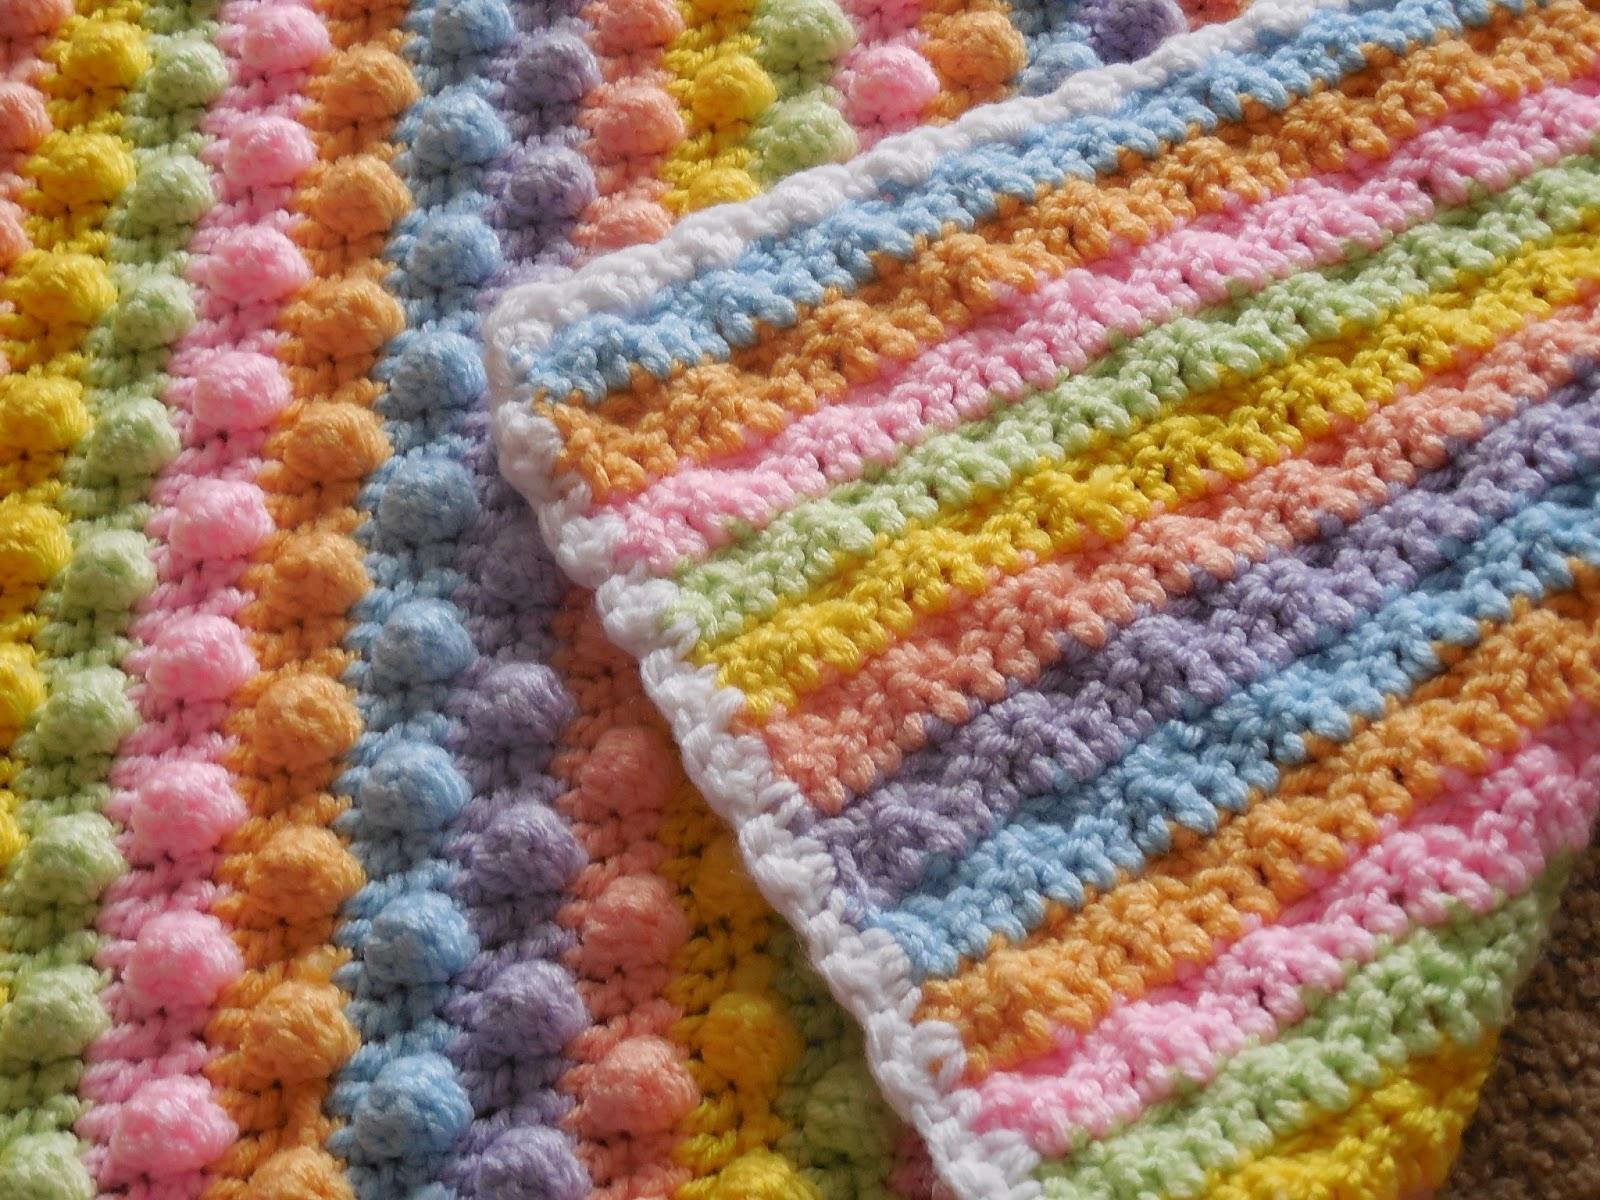 Crochet Pattern For Popcorn Stitch Baby Blanket : Hooked On Handmade: Popcorn stitch blanket